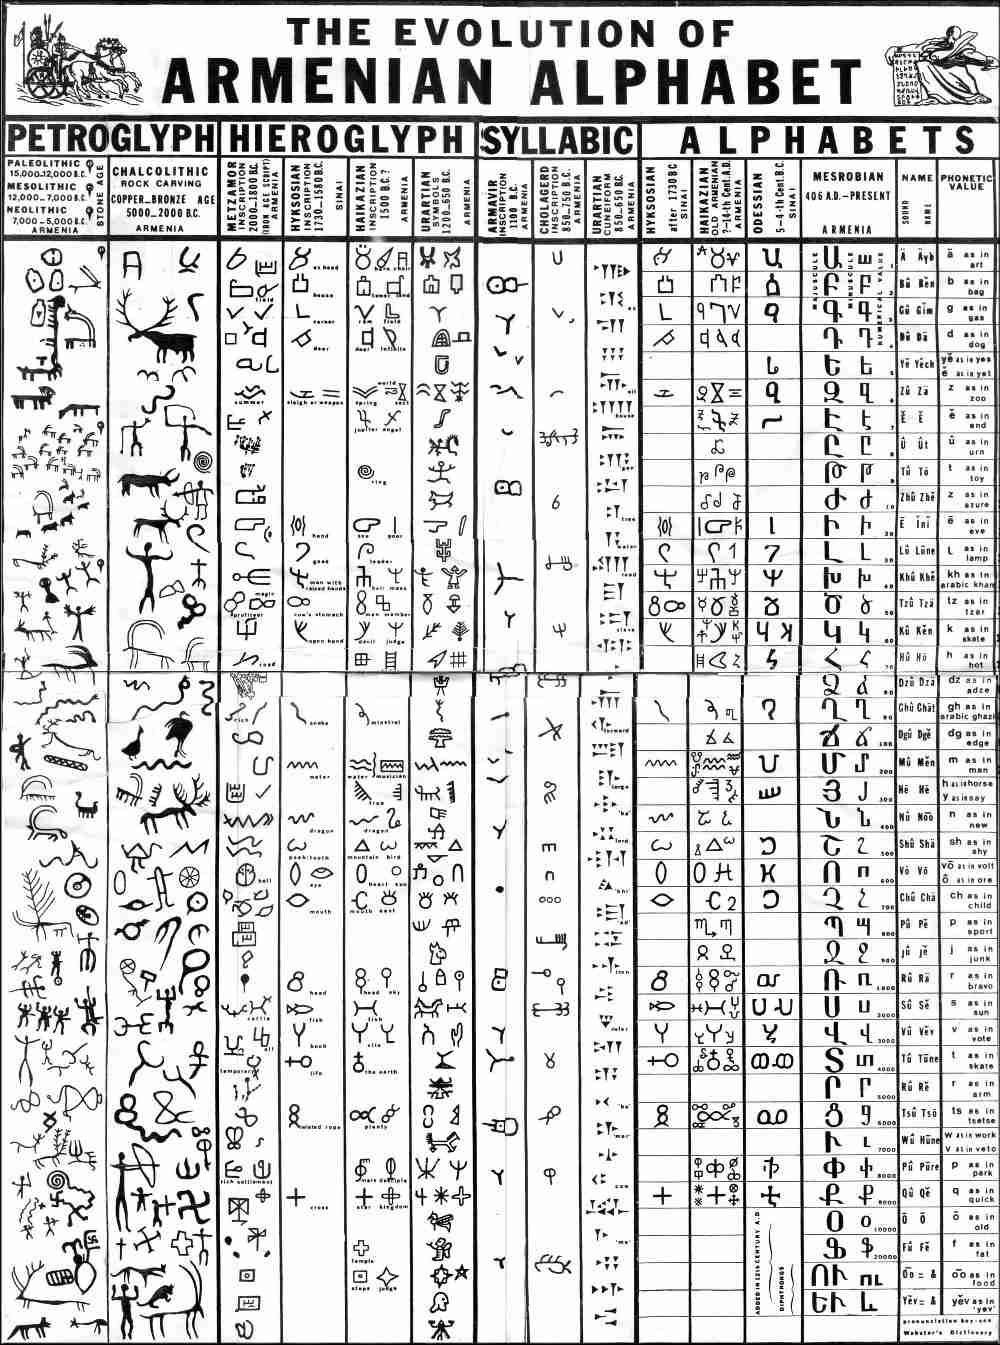 Evolution of the Armenian Alphabet. Petrogylph – Heirogylph – Syllabic – Alphabet. via InformationisBeautiful.net